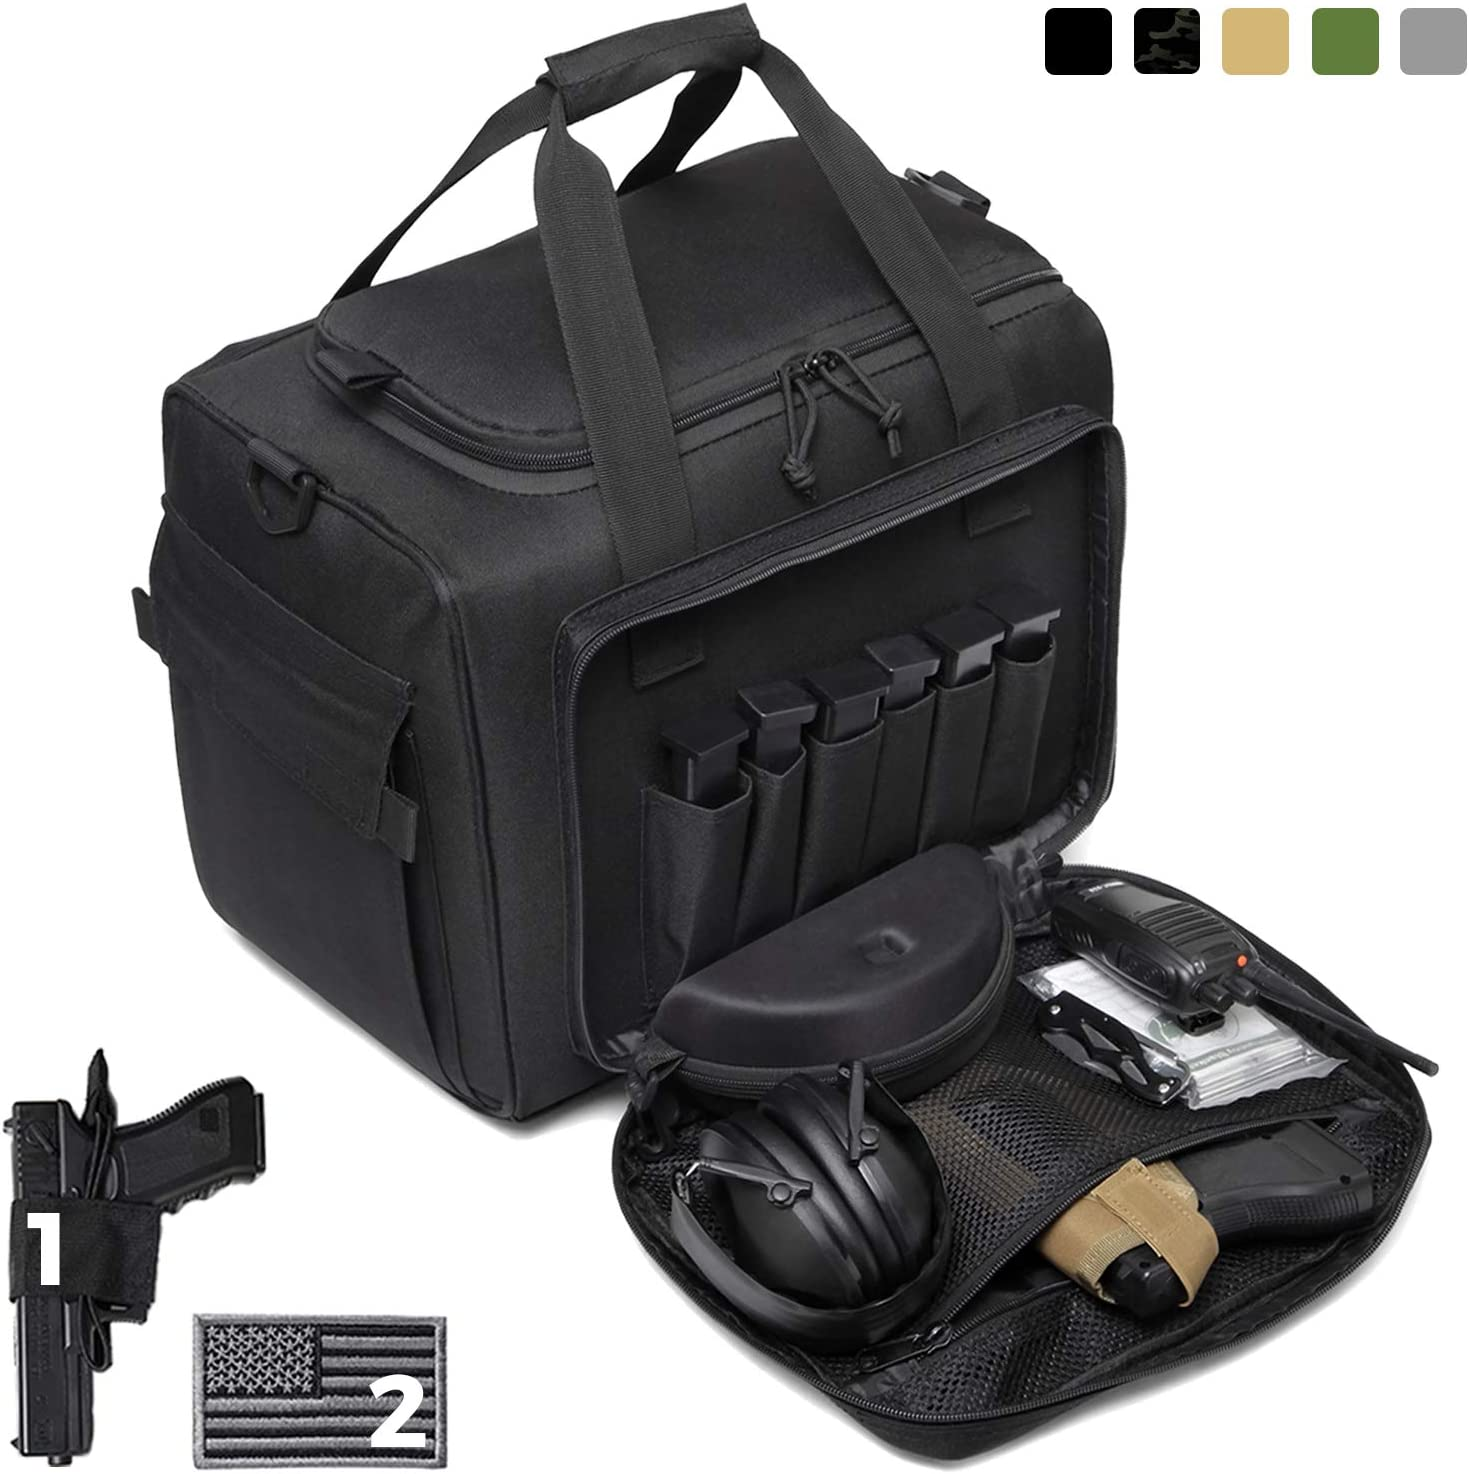 DBTAC Gun Range Bag Large | Tactical Pistol Shooting Range Duffle Bag for 4+ Handguns Range Trip - 2 in 1 Camera Duffel Bag with 2X Removable Velcro Divider for DSLR